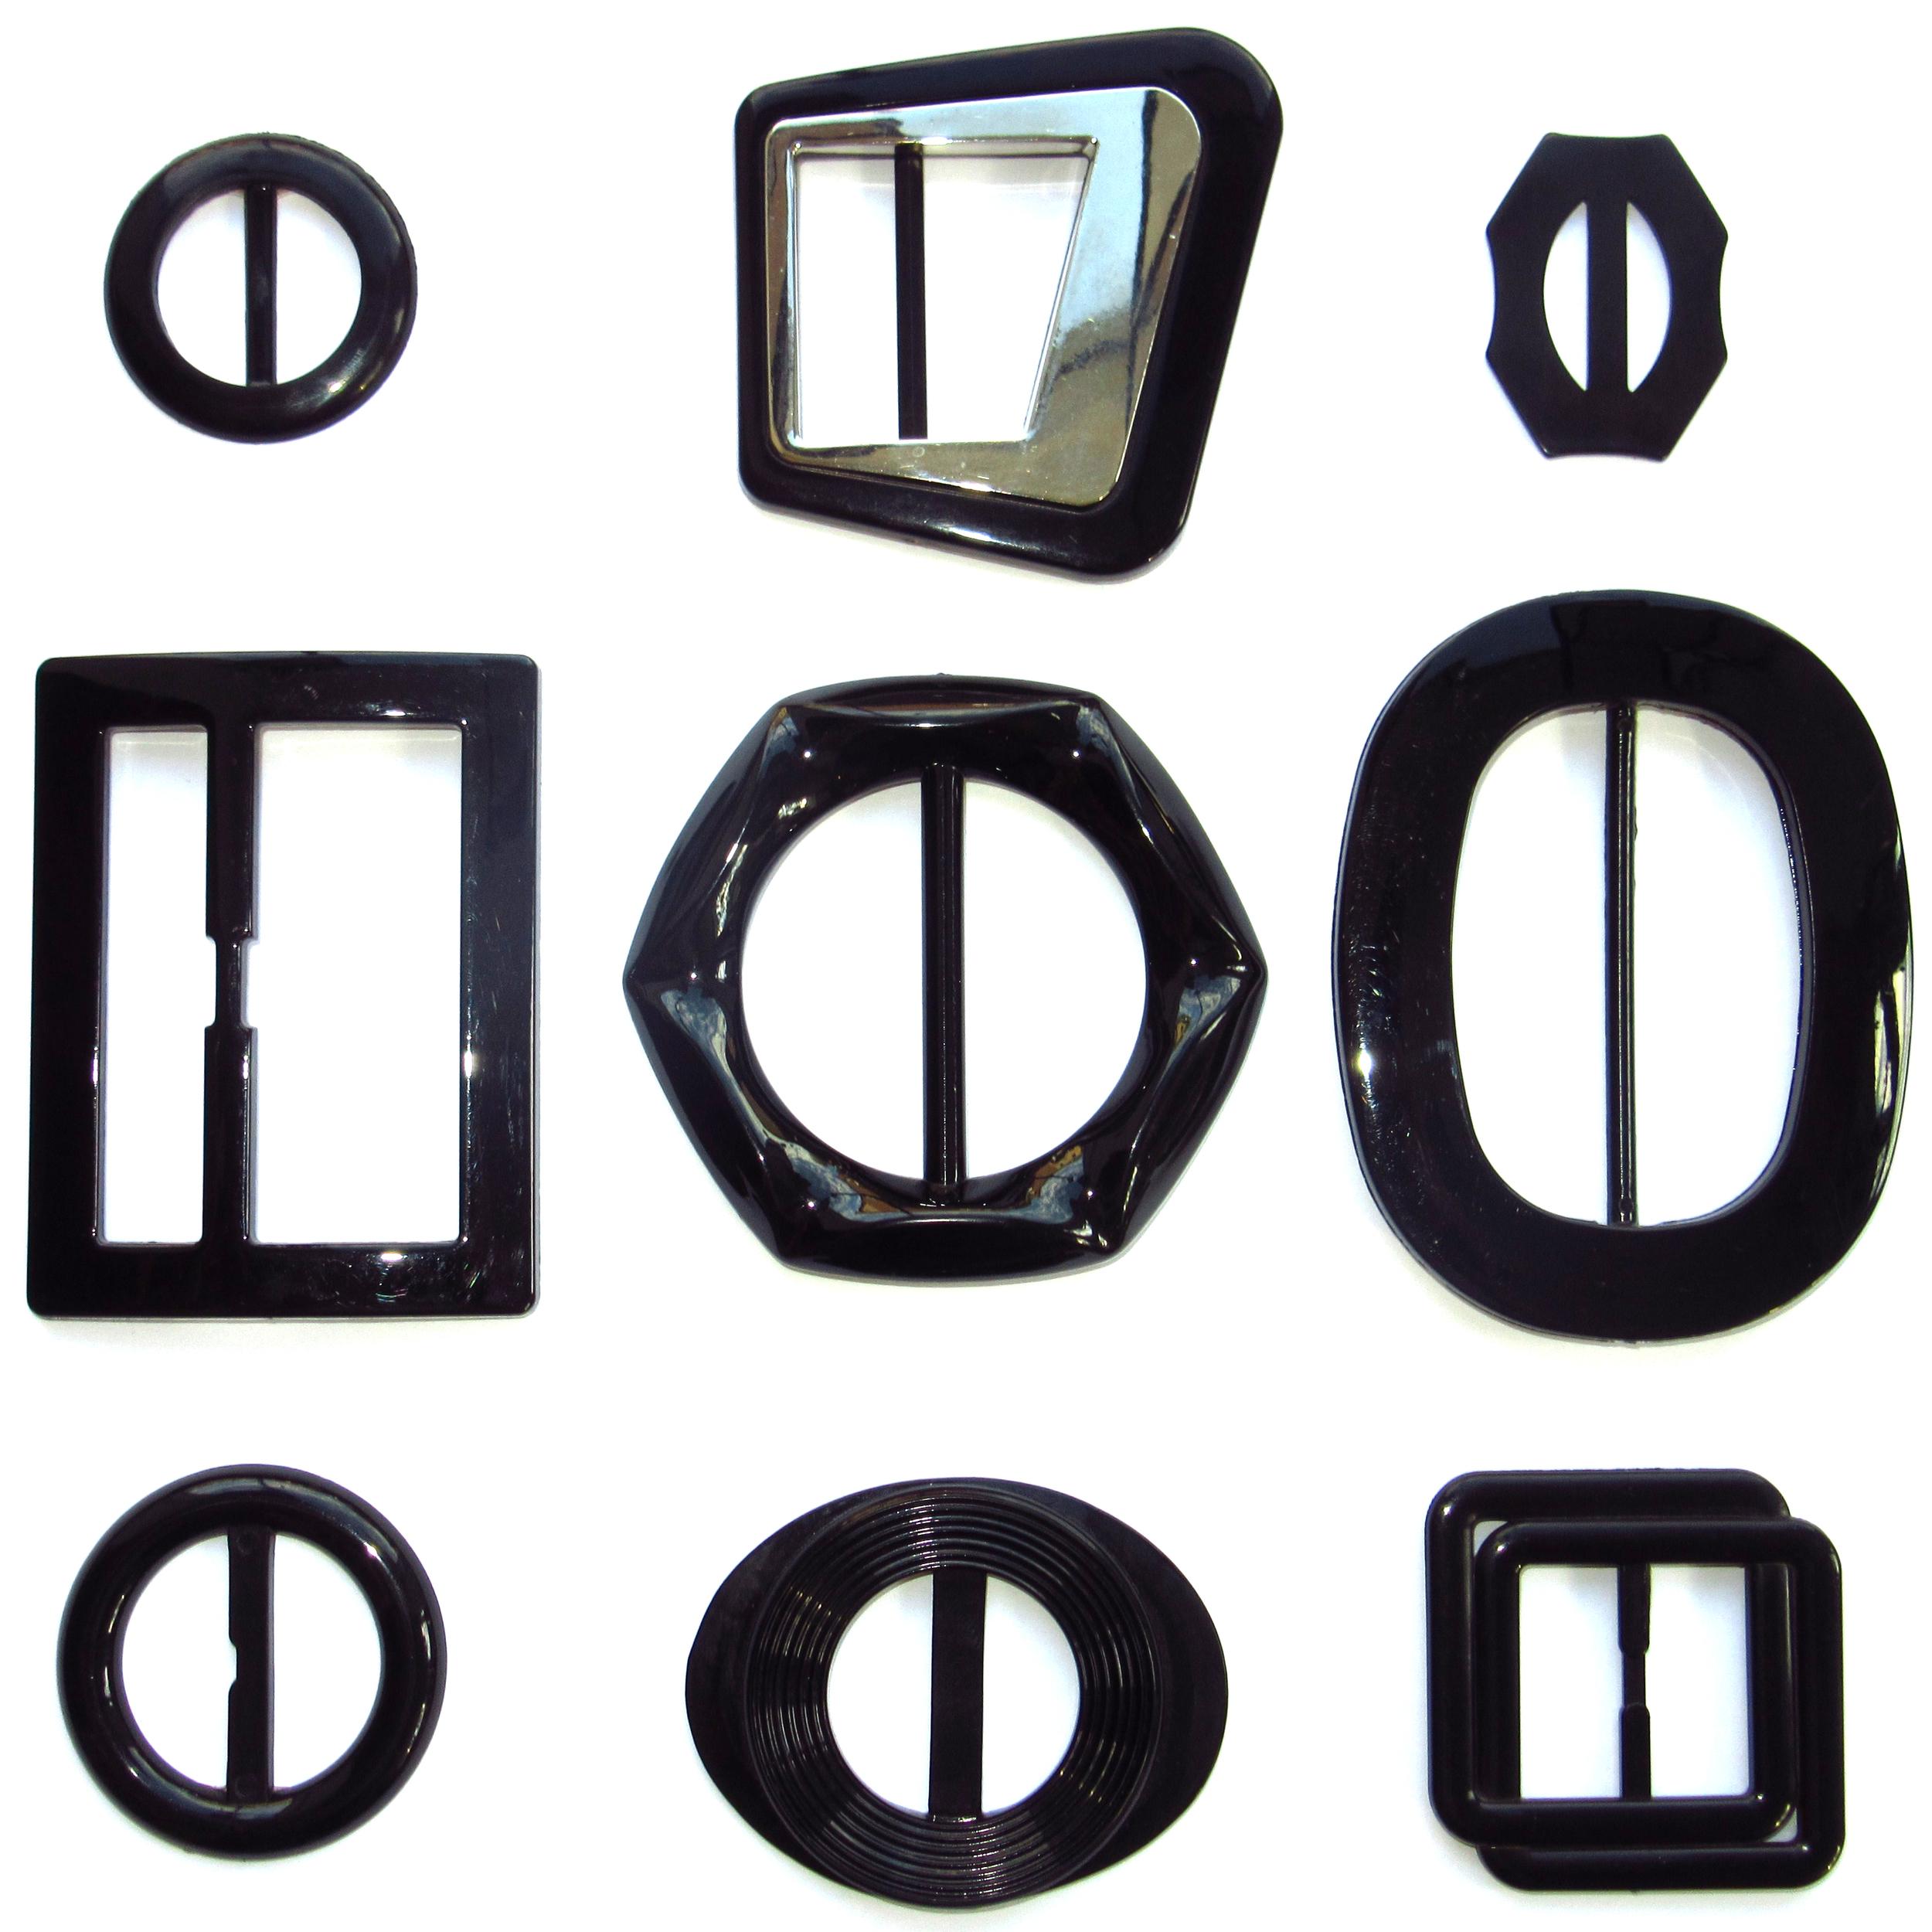 Black plastic belt buckles